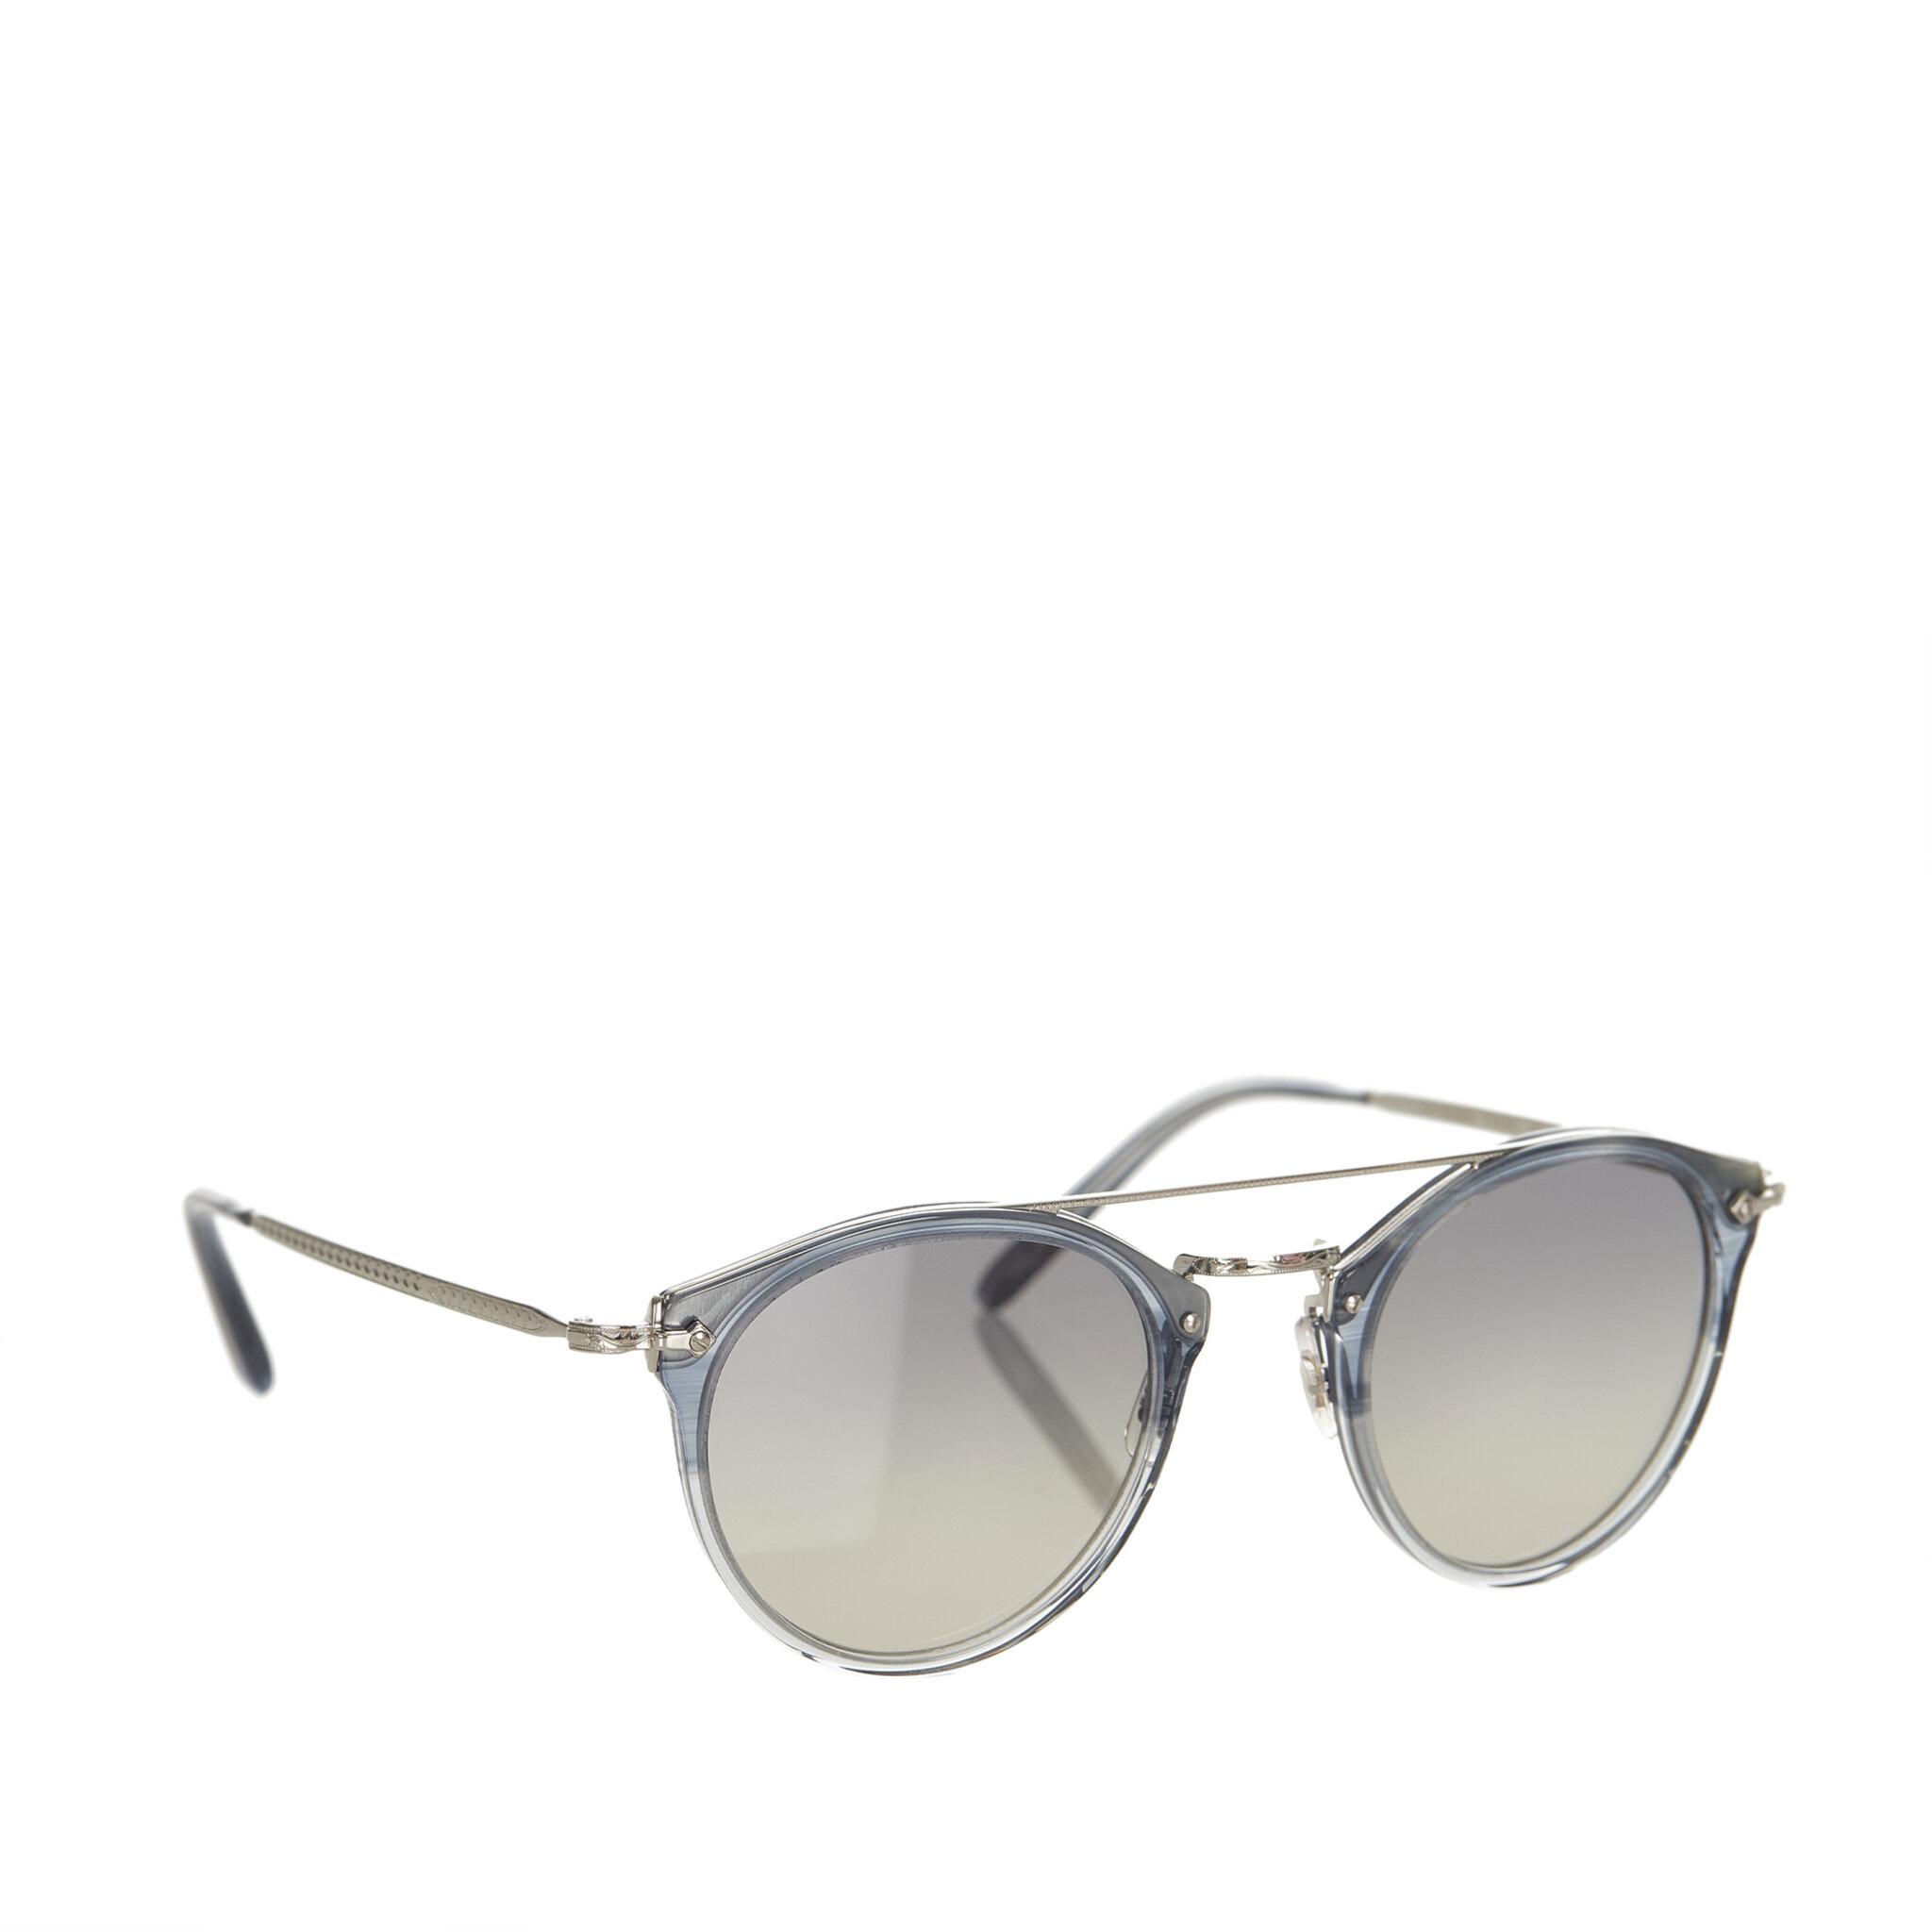 Oliver Peoples Shai Round Tinted Sunglasses, ONESIZE